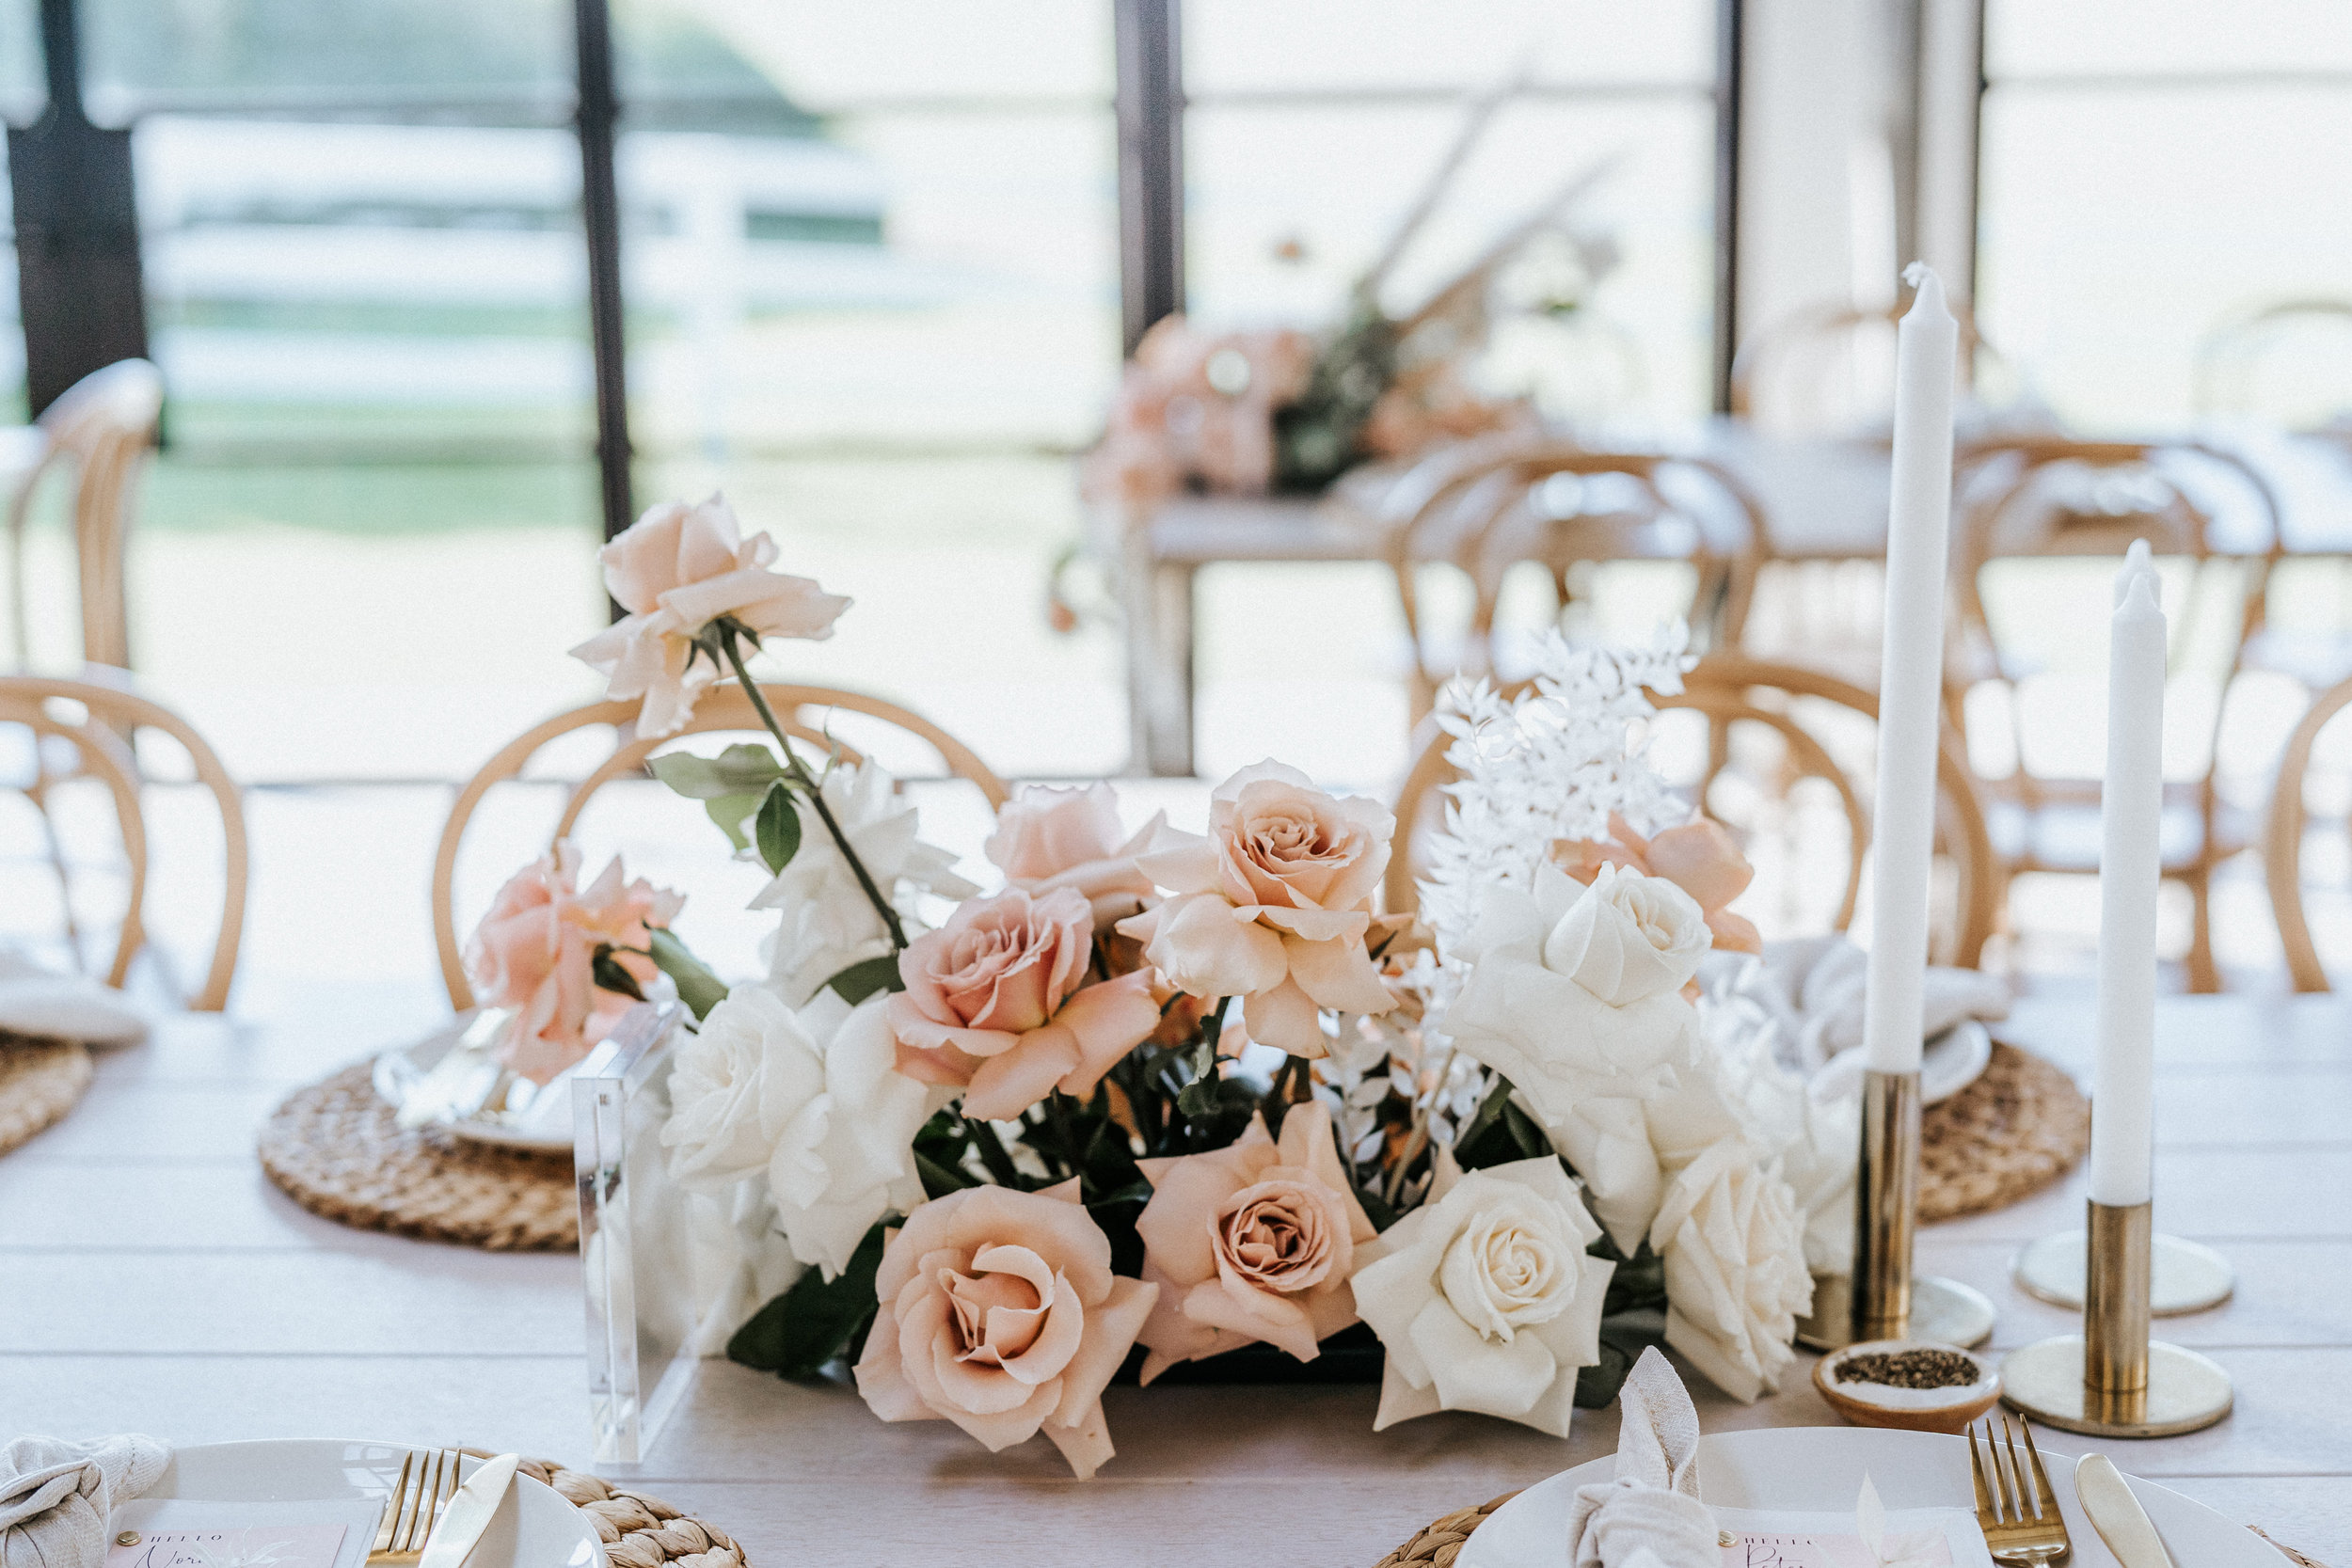 gemaya-tim-bilmon-wedding-8.jpg